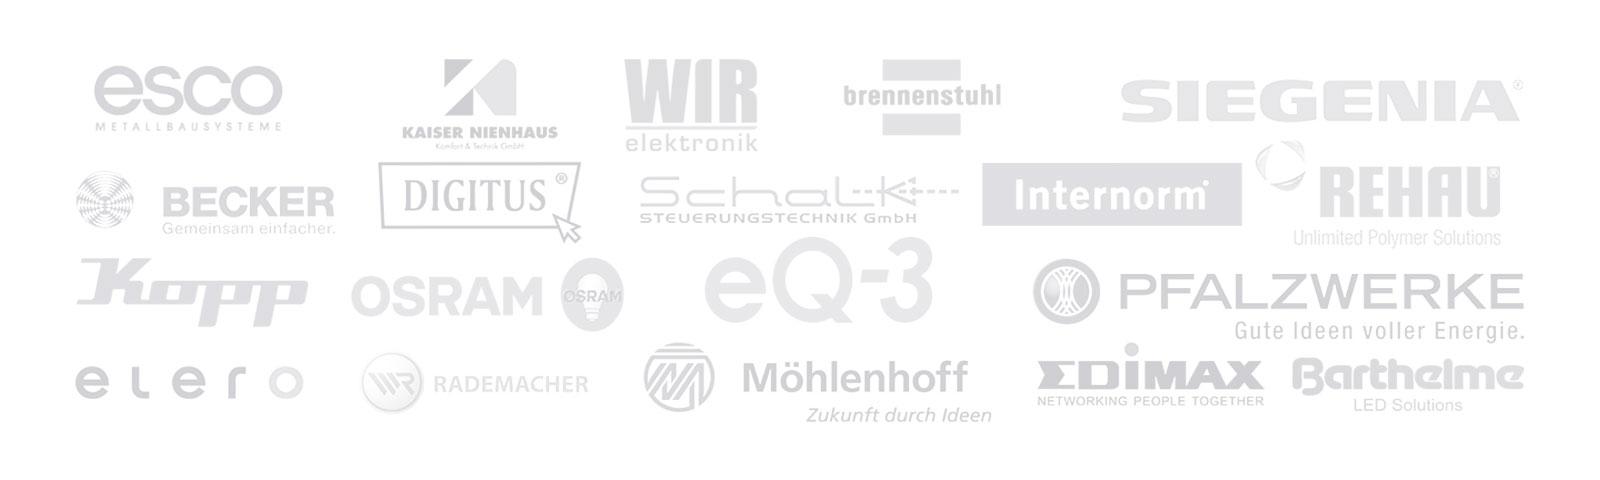 logos-b2b